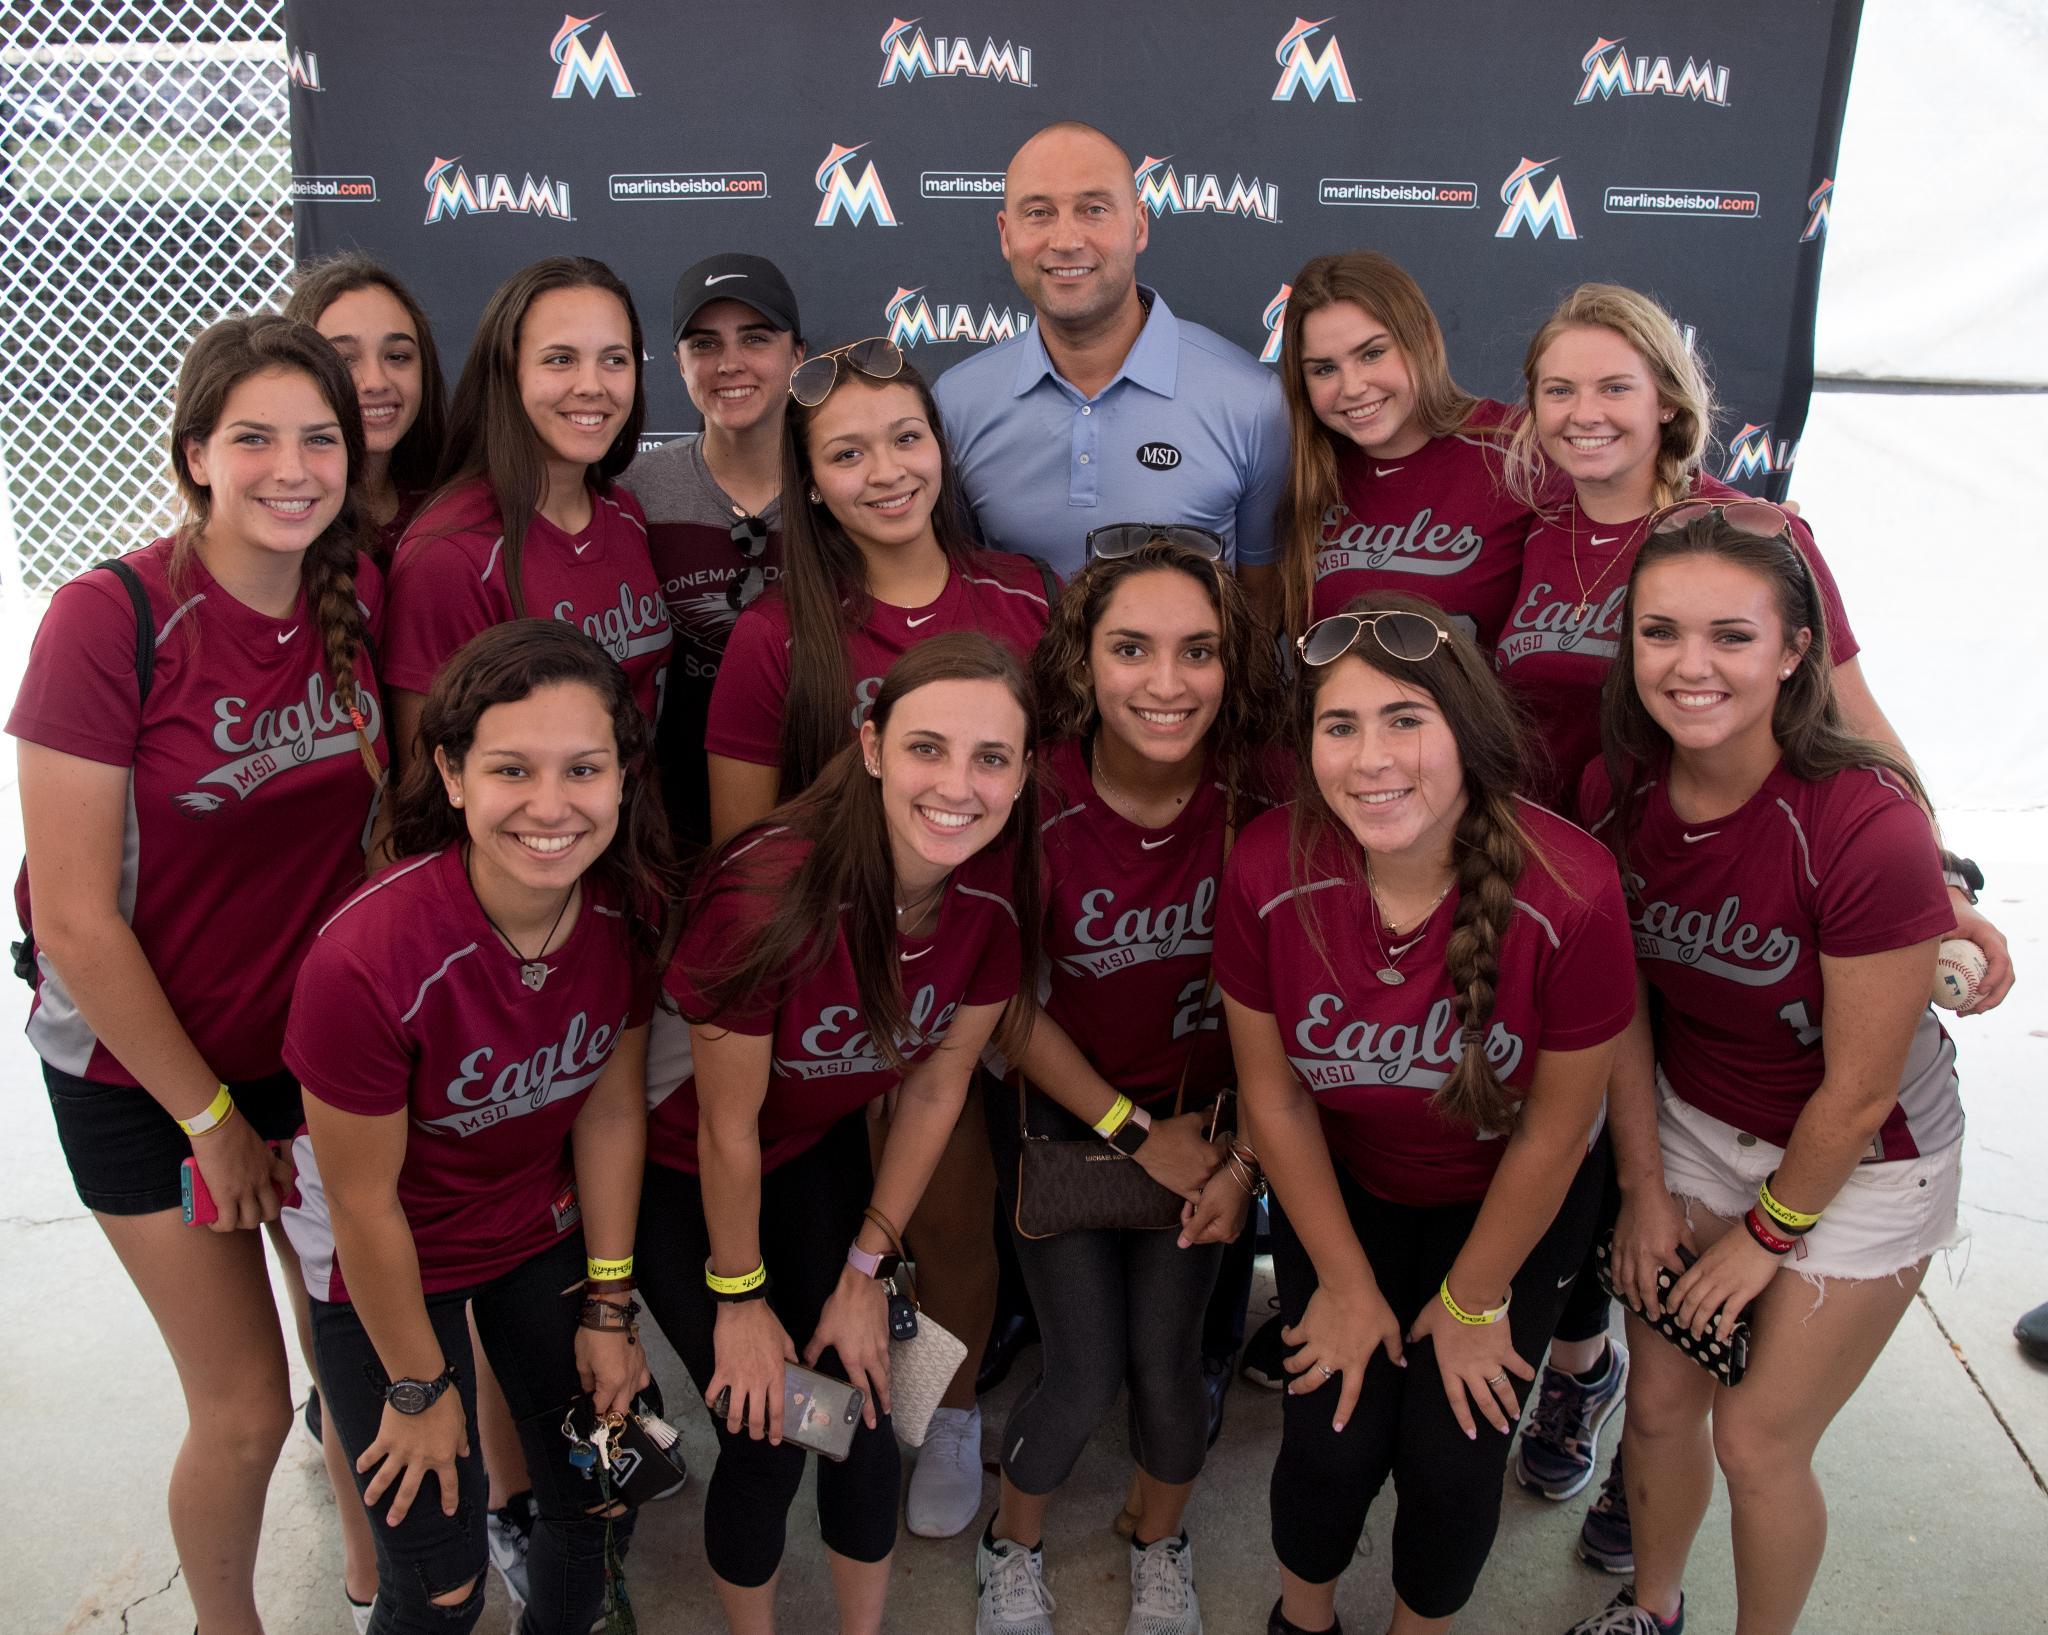 Marjory Stoneman Douglas HS baseball and softball teams meet Derek Jeter and the @Marlins. #ParklandStrong https://t.co/4UMbV8odN8